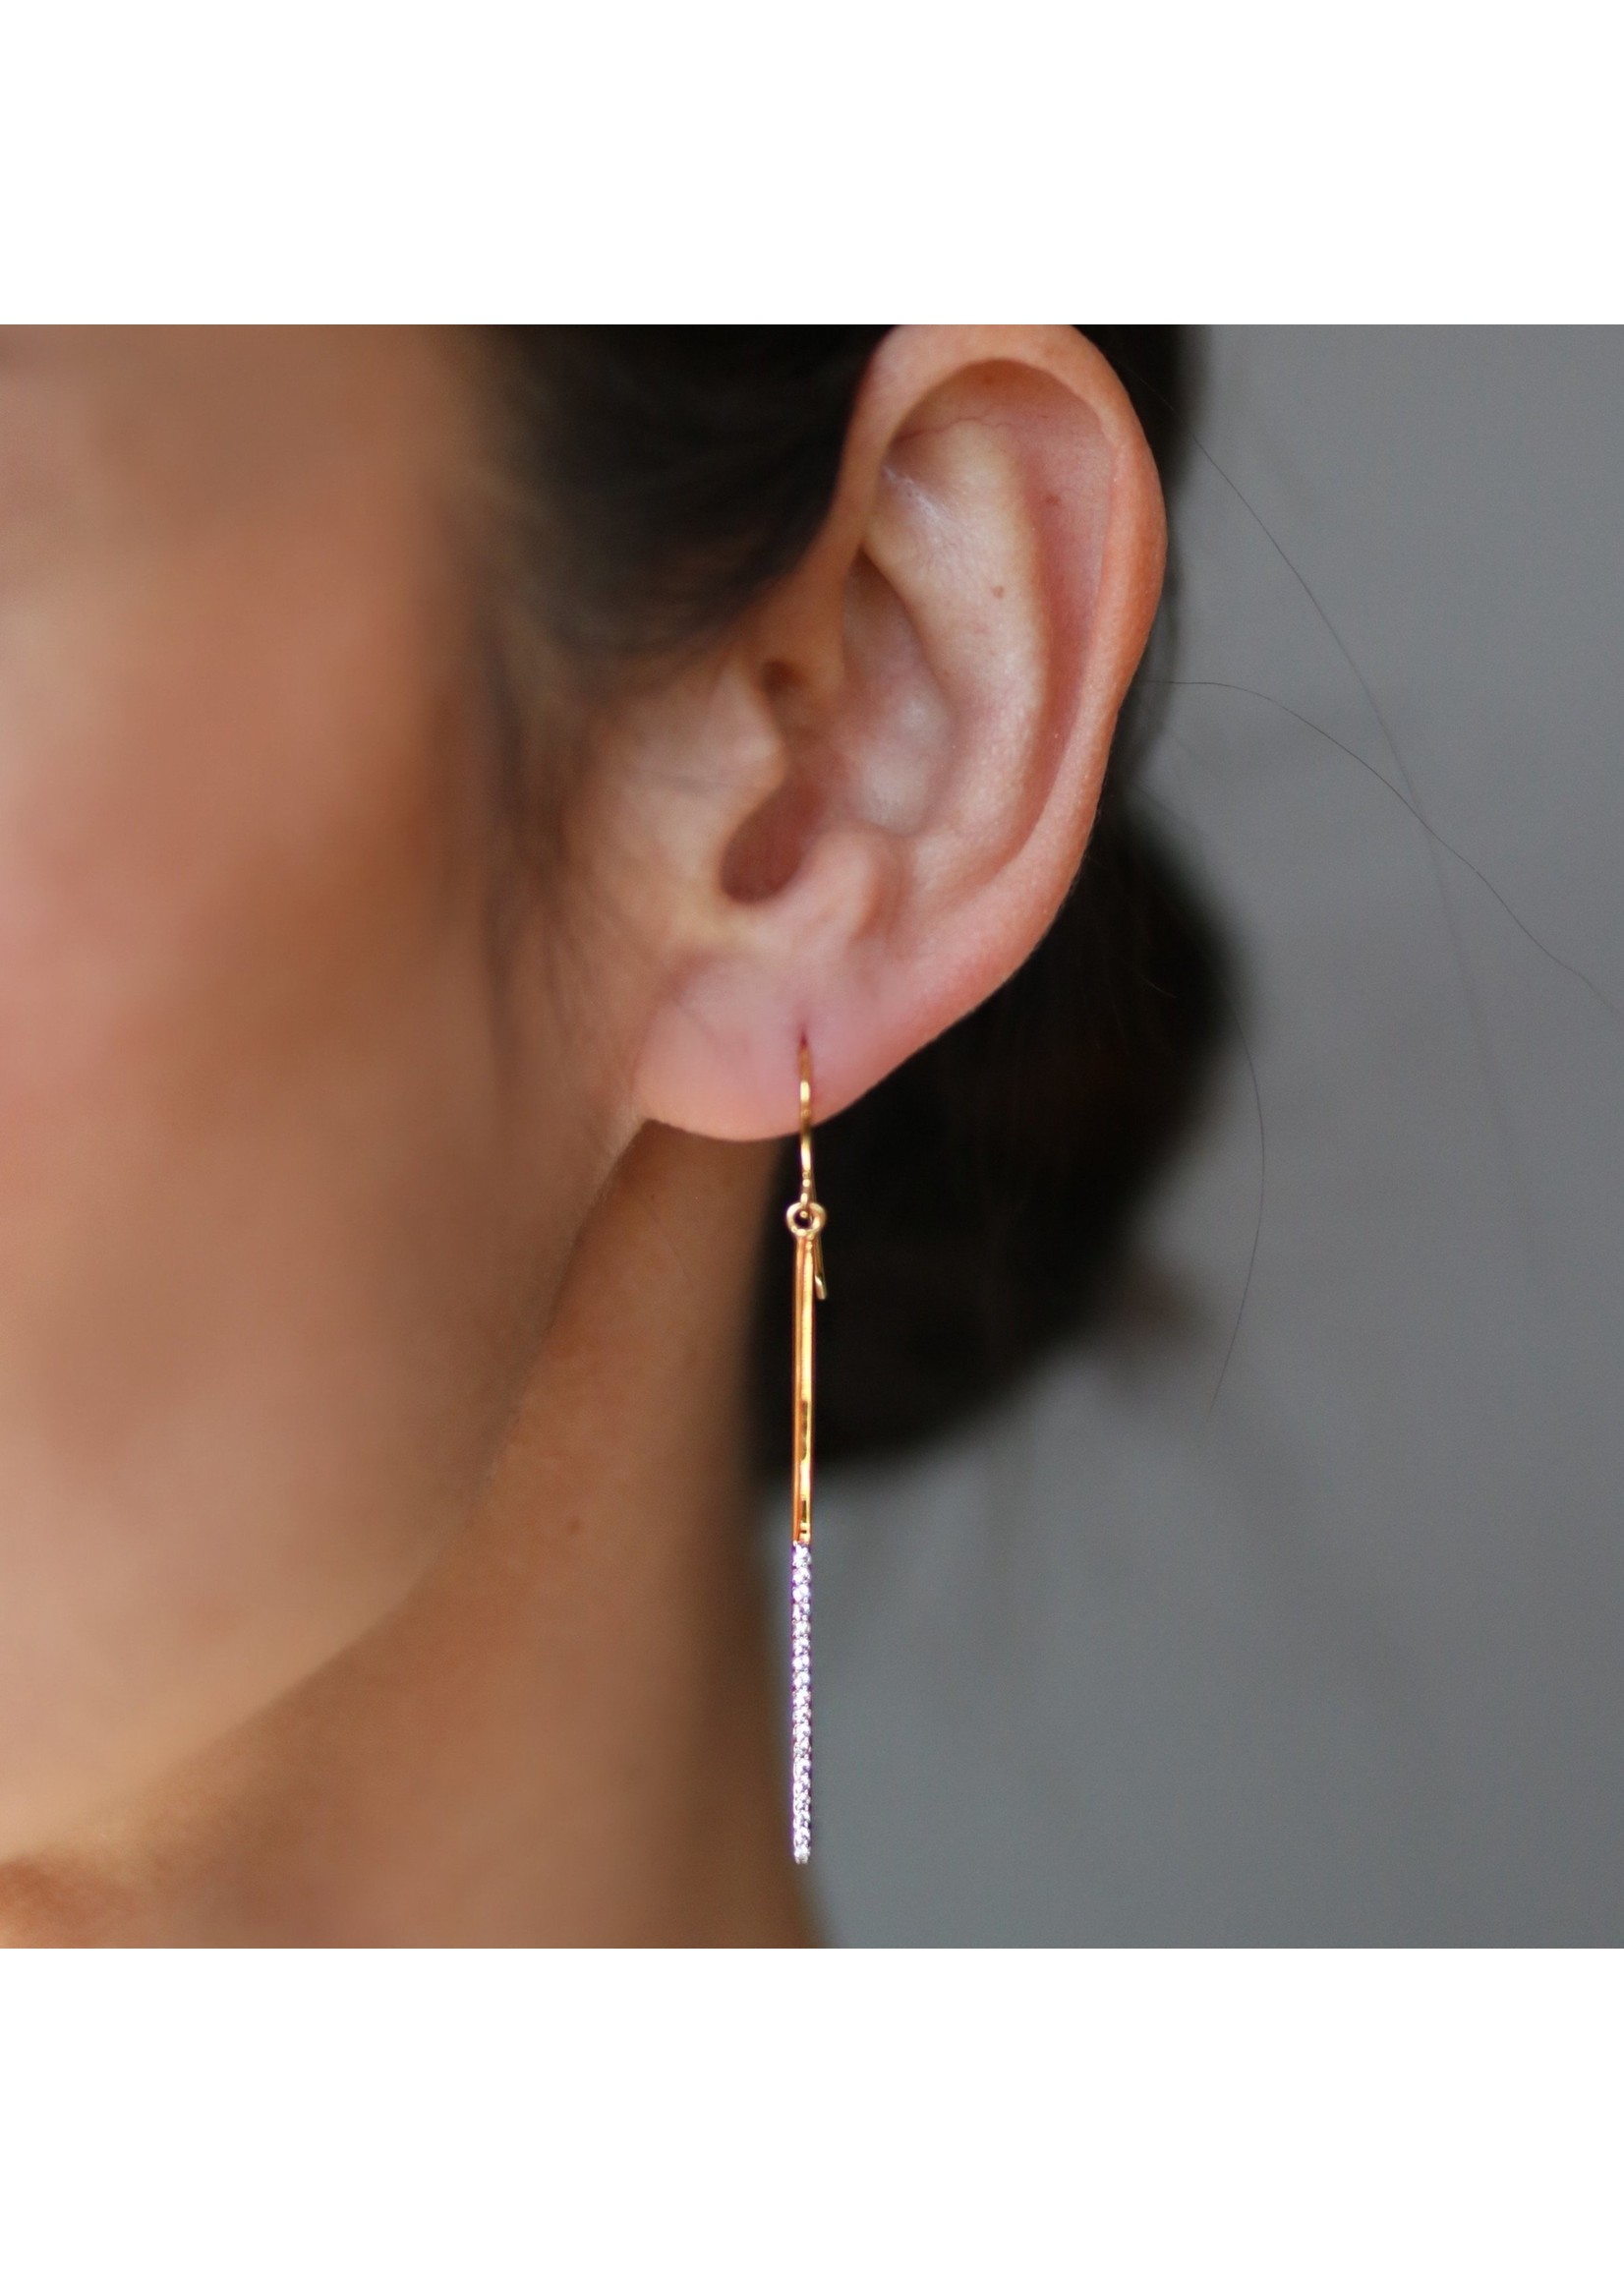 Pin Drop Earrings - Gold